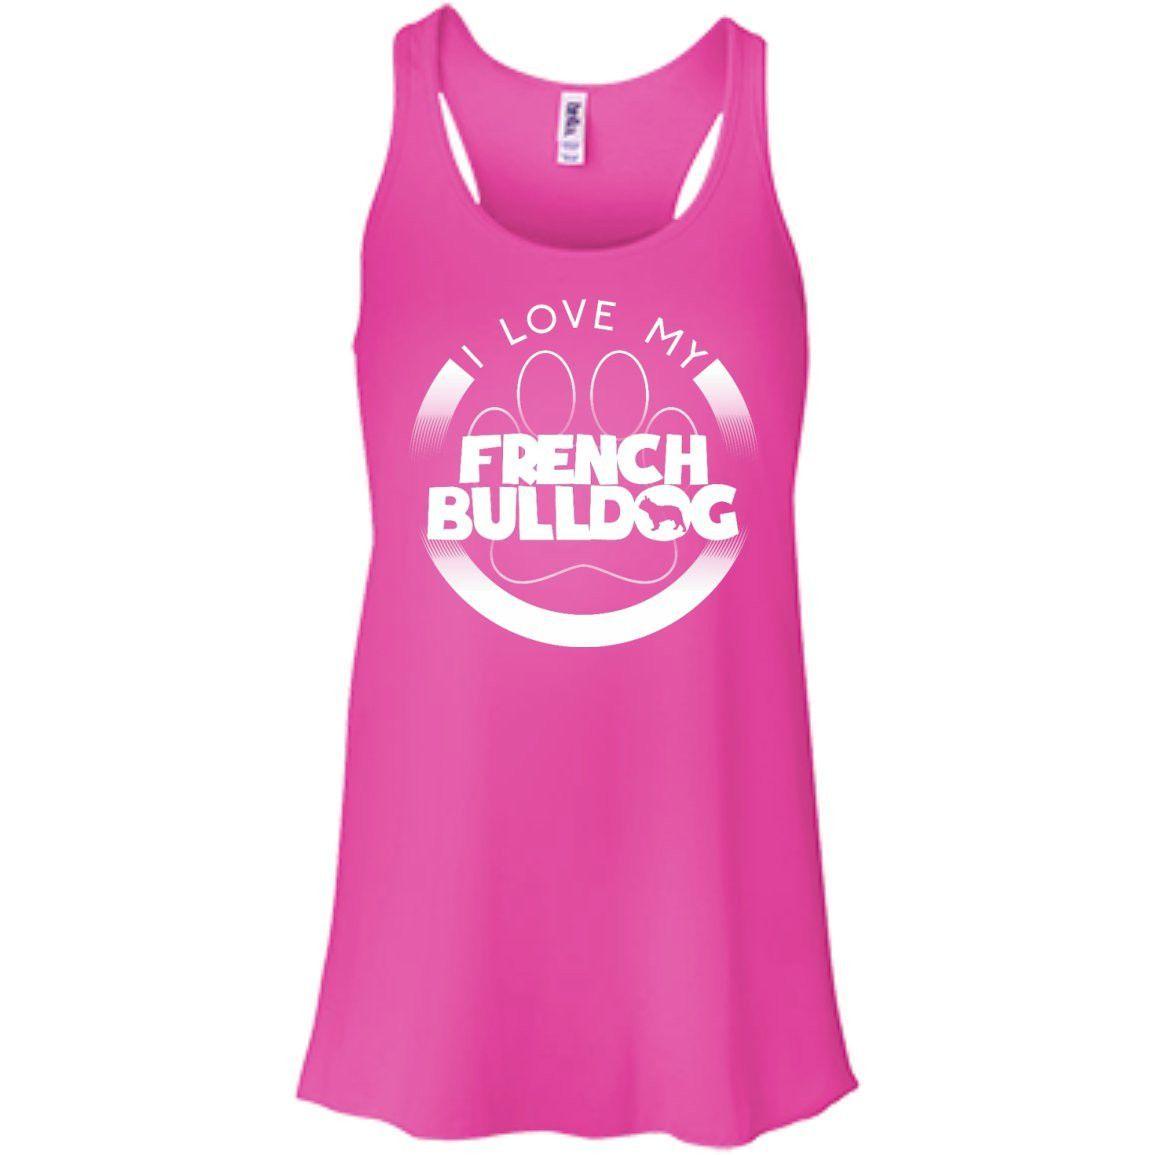 I LOVE MY FRENCH BULLDOG (Paw Design) - Front Design - Bella+Canvas Flowy Racerback Tank